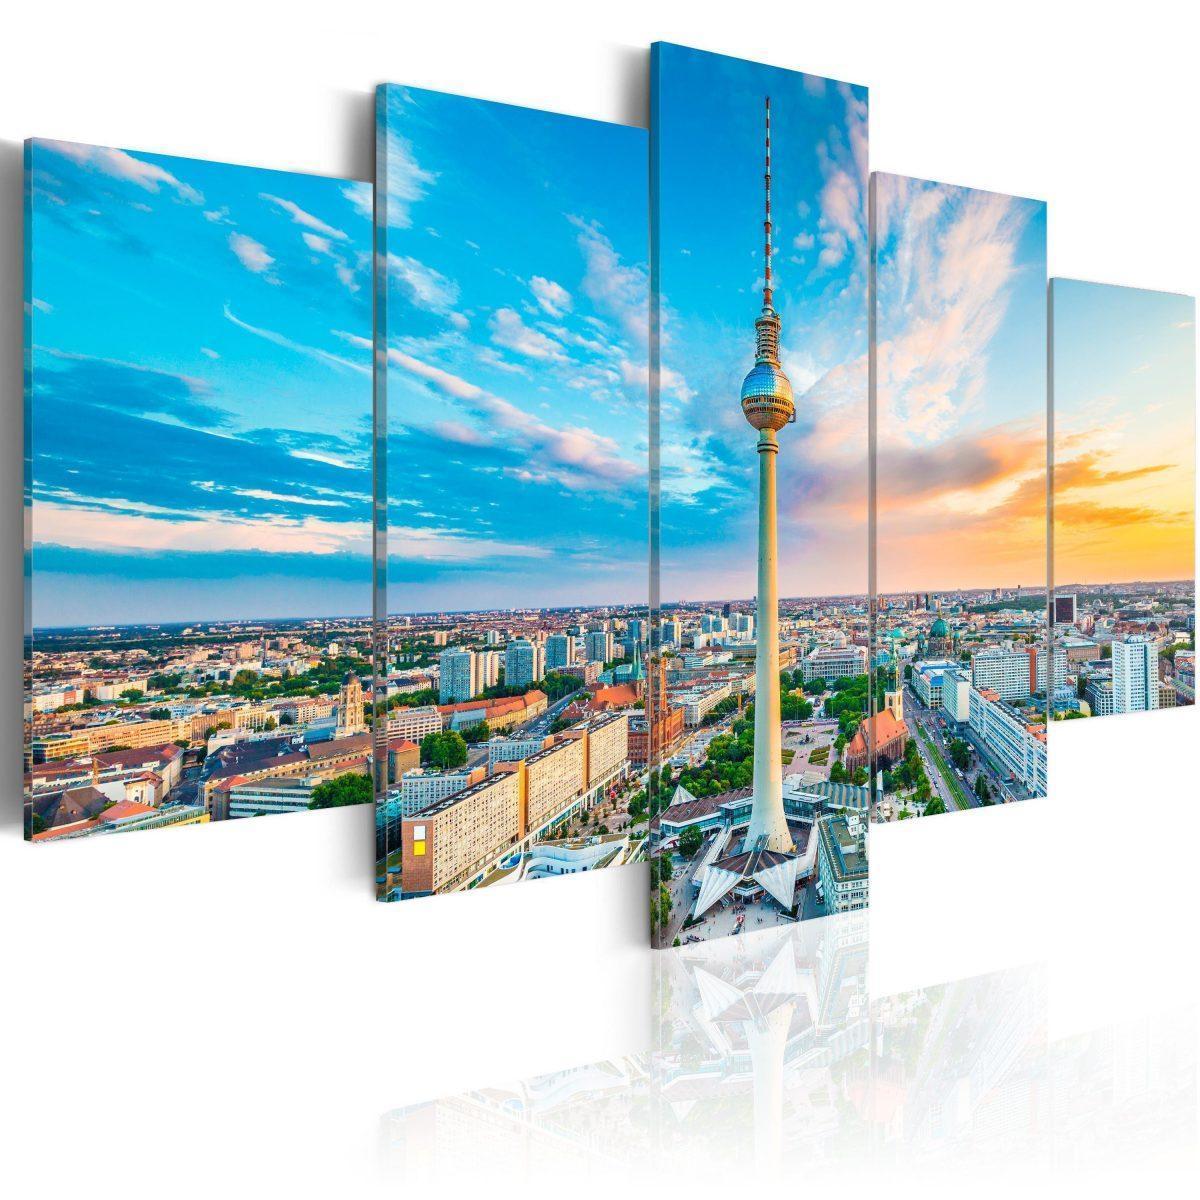 Canvas Tavla - Berlin TV Tower, Germany - 200x100